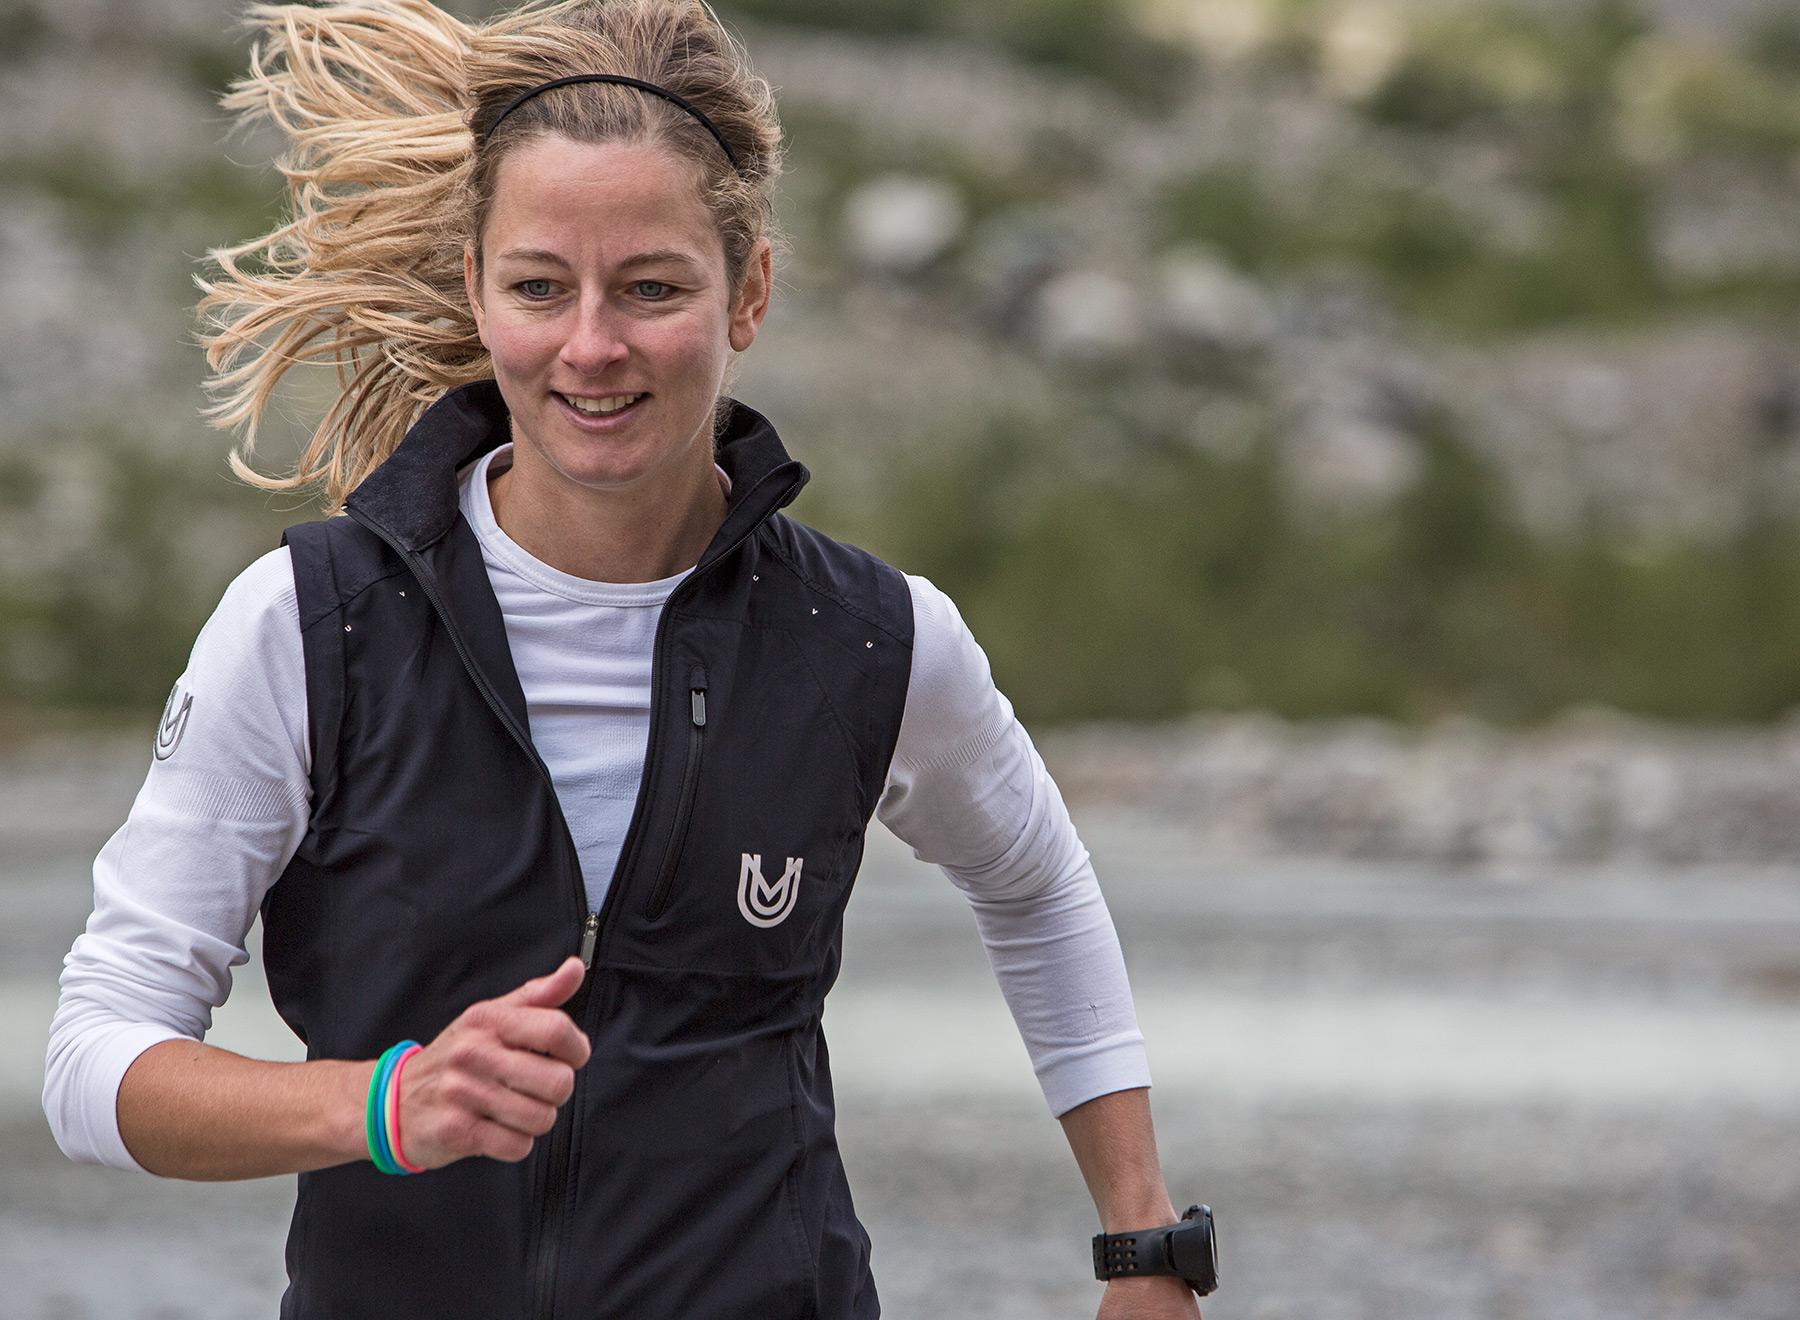 12-UVU-Anne-Marie-Flammersfeld-Running-Engadin